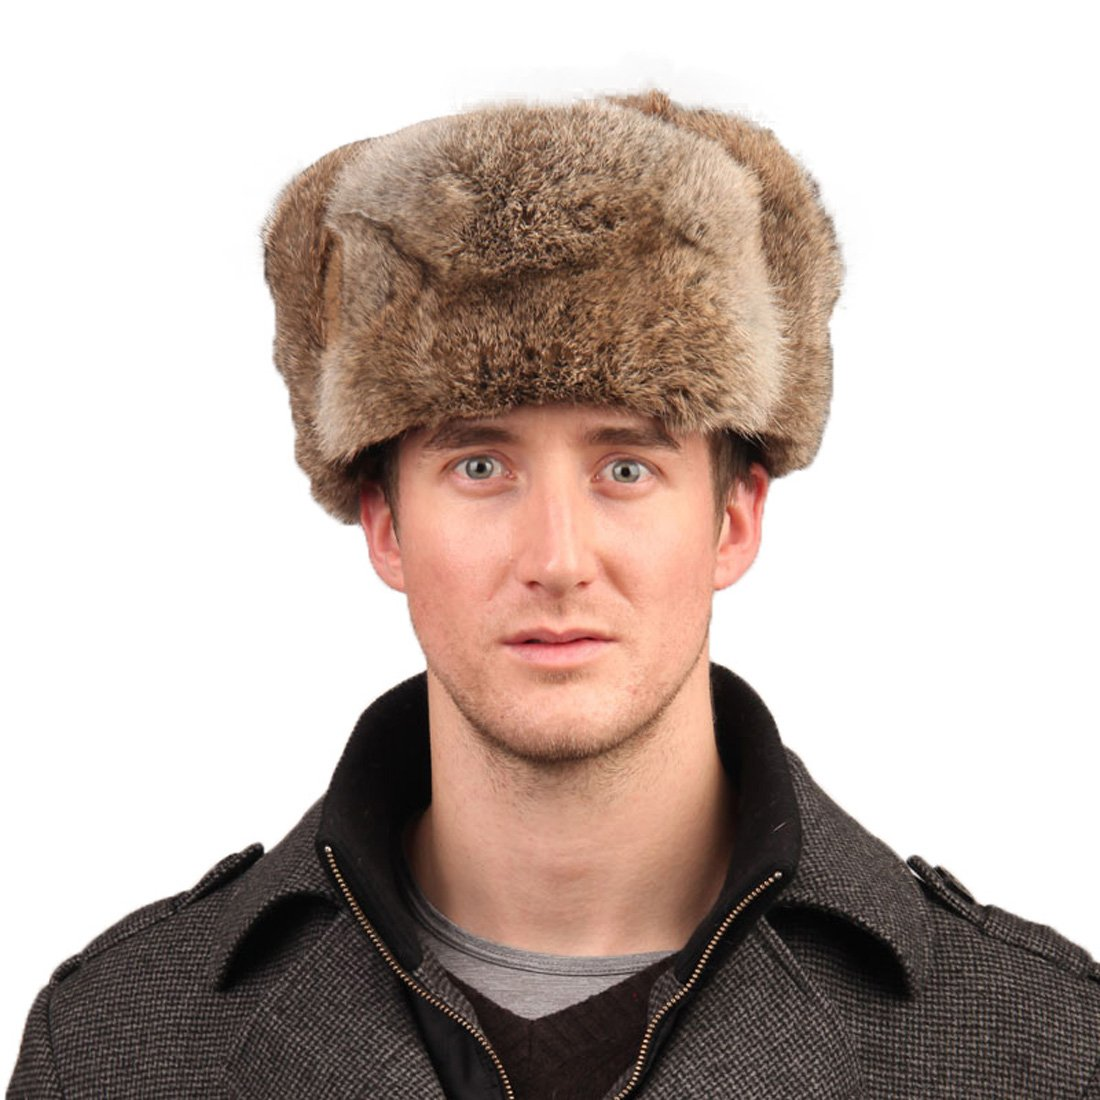 Men s Rabbit Full Fur Russian Ushanka Trooper Hats Multicolor (Brown) at  Amazon Men s Clothing store  4ec801e68842